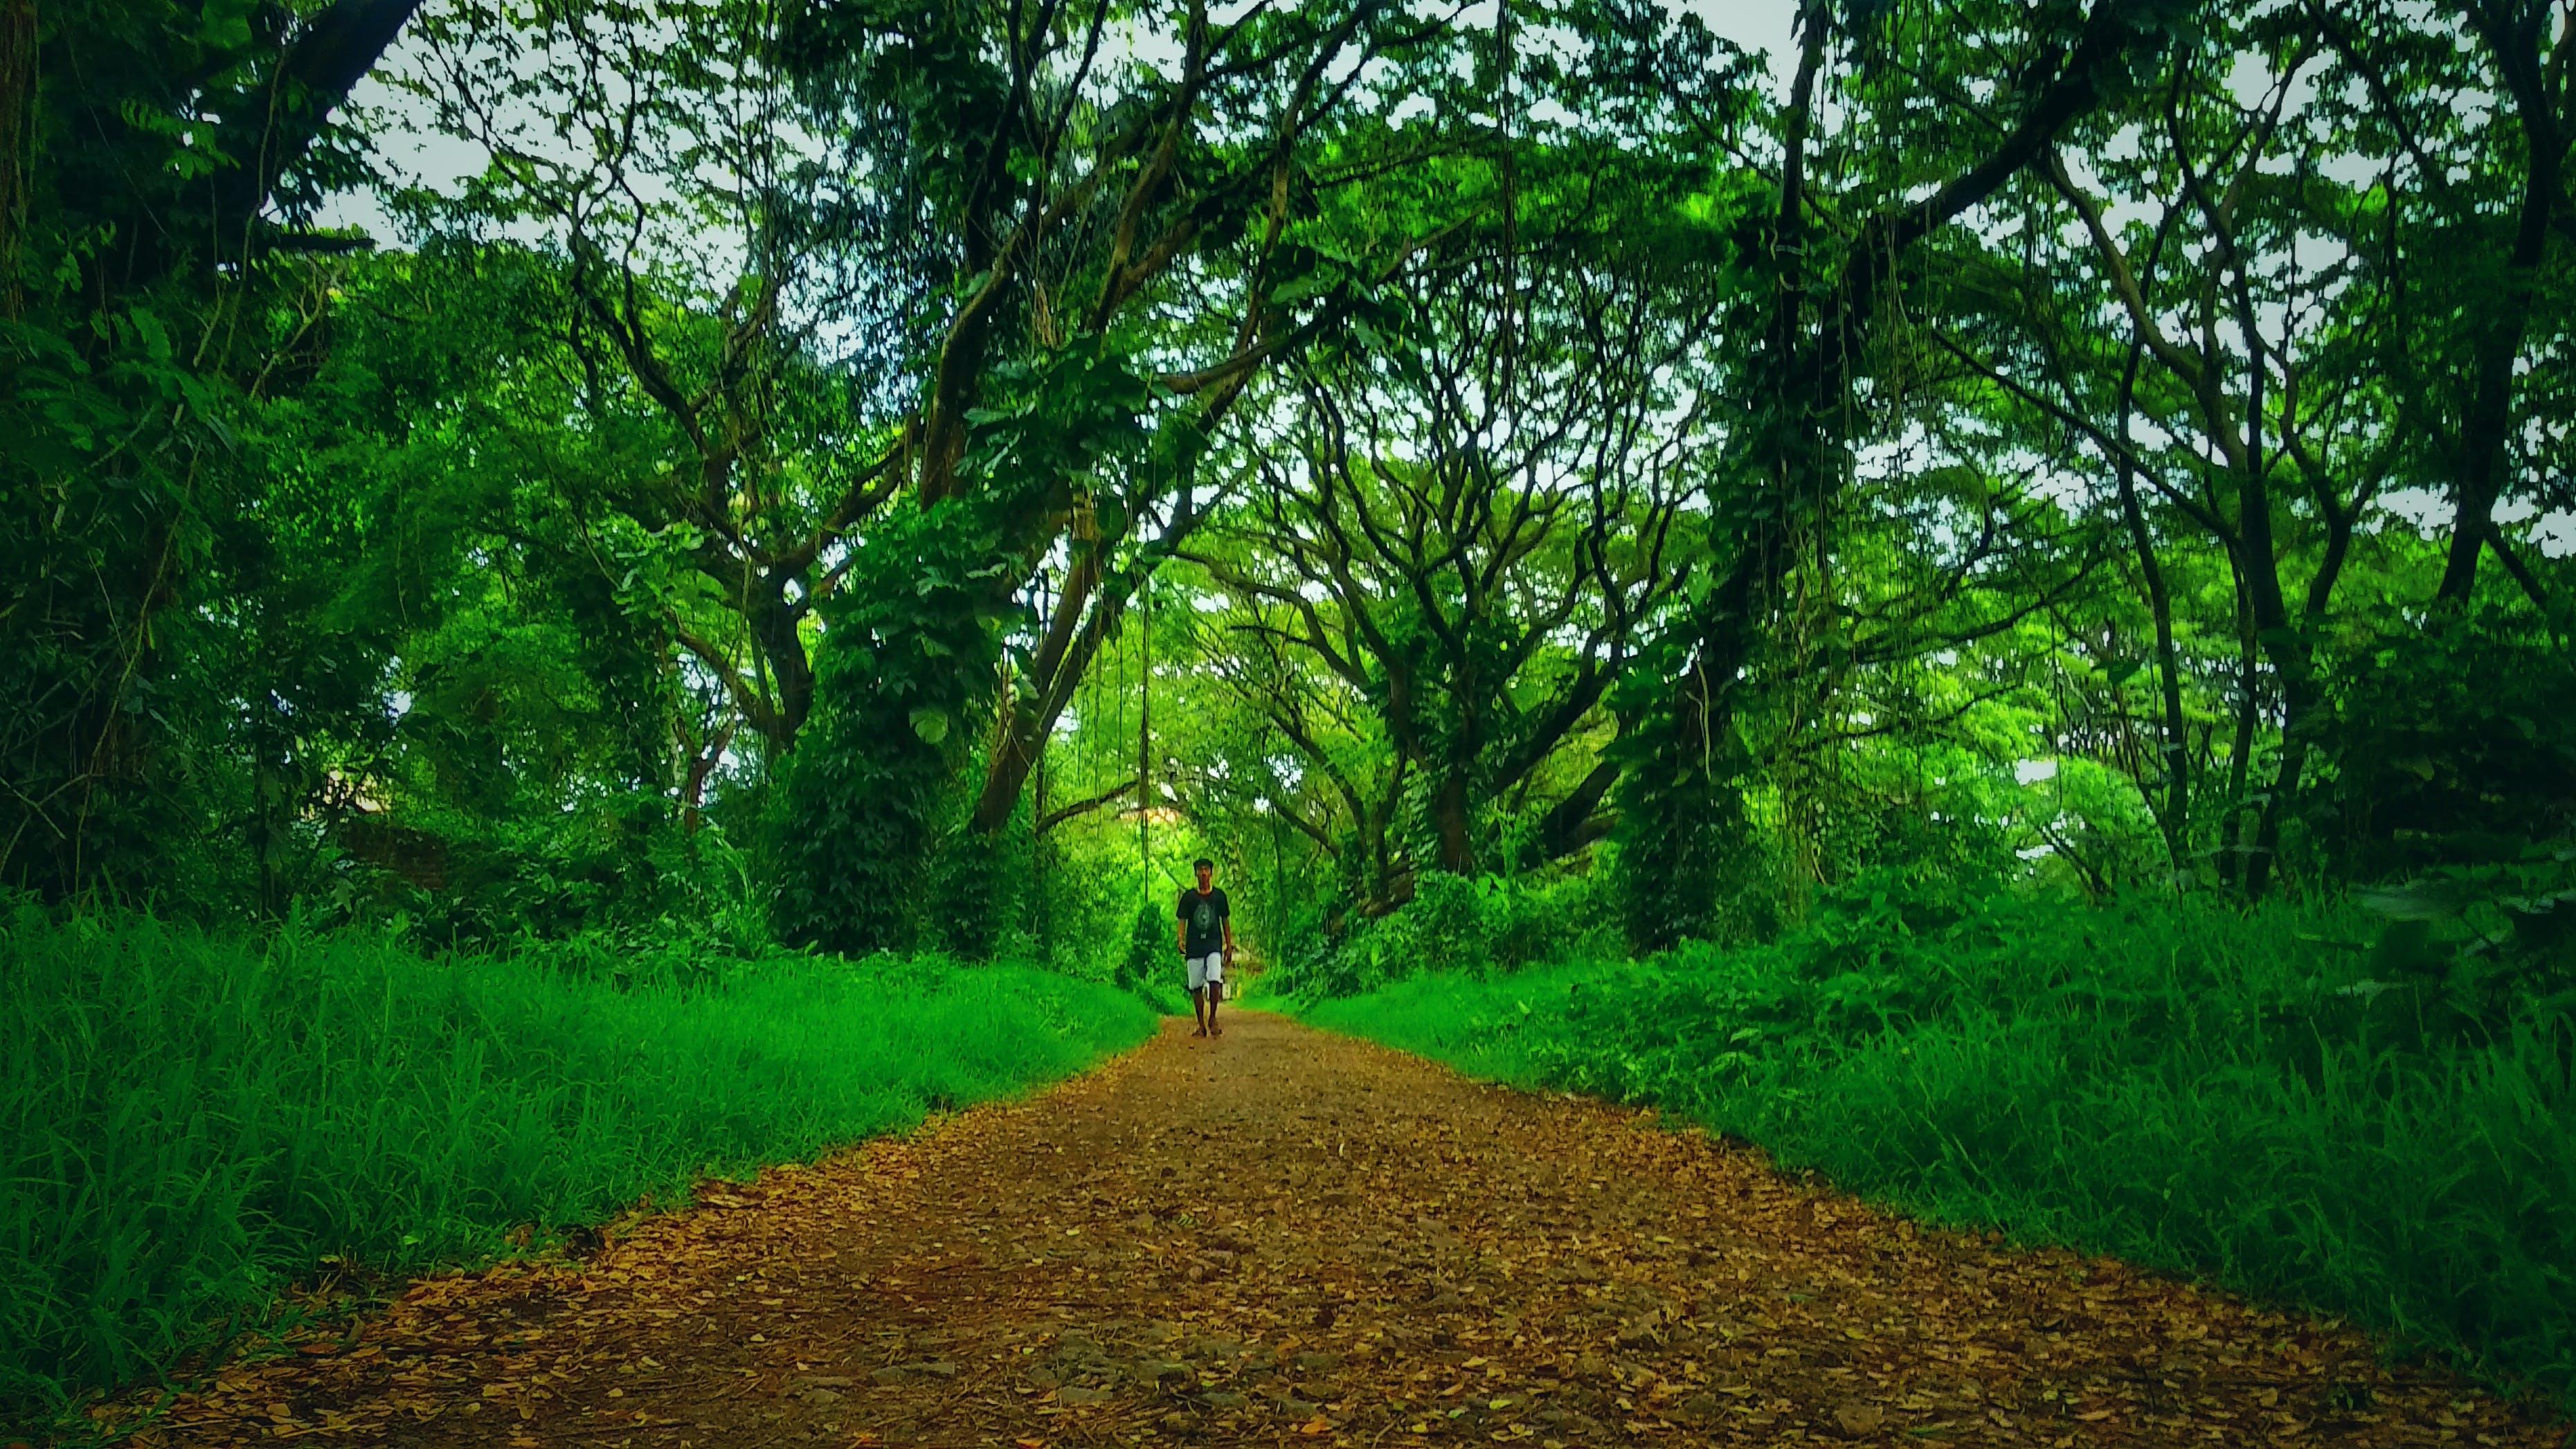 Free stock photo of #outdoorchallenge, #Tree, abandoned, adventure